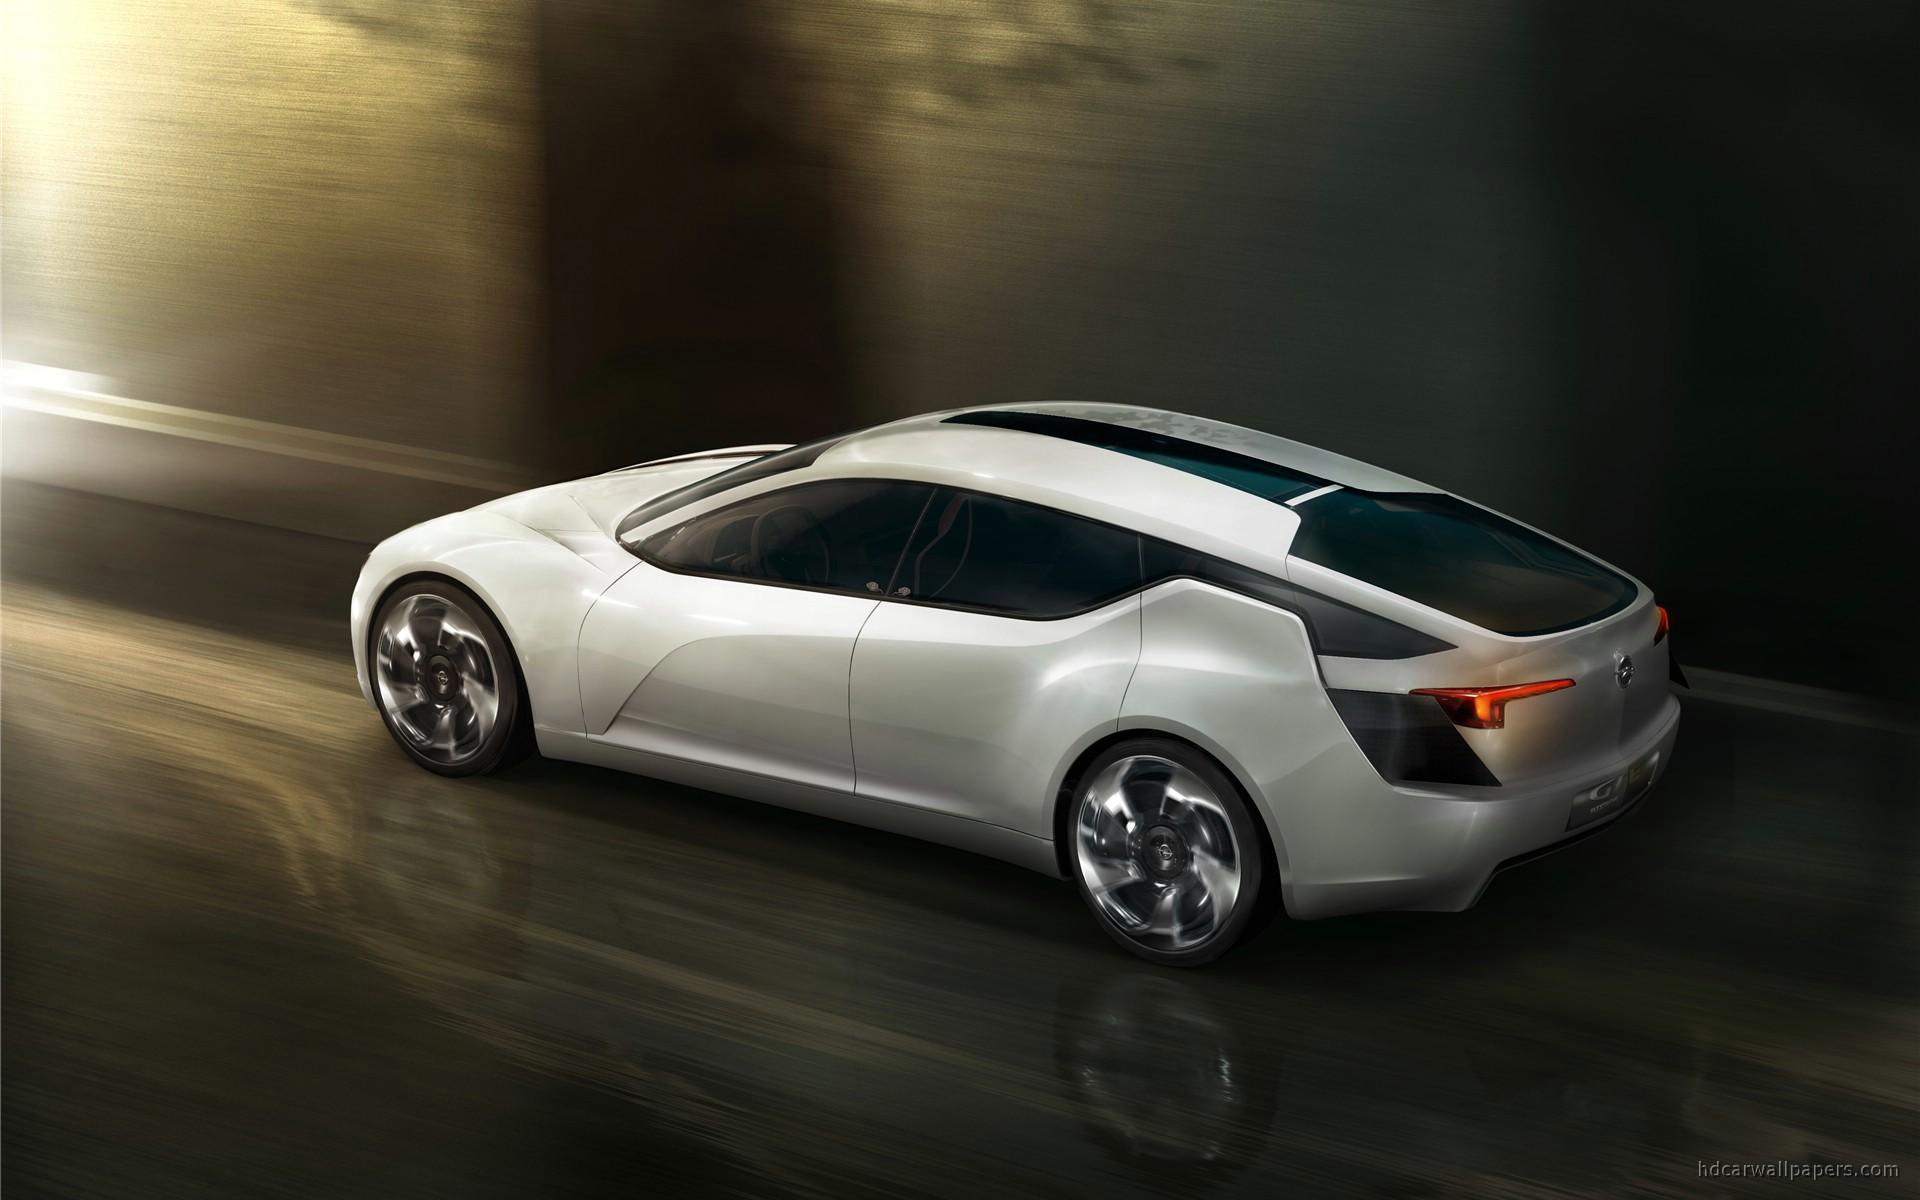 2010 Opel Flextreme GT E